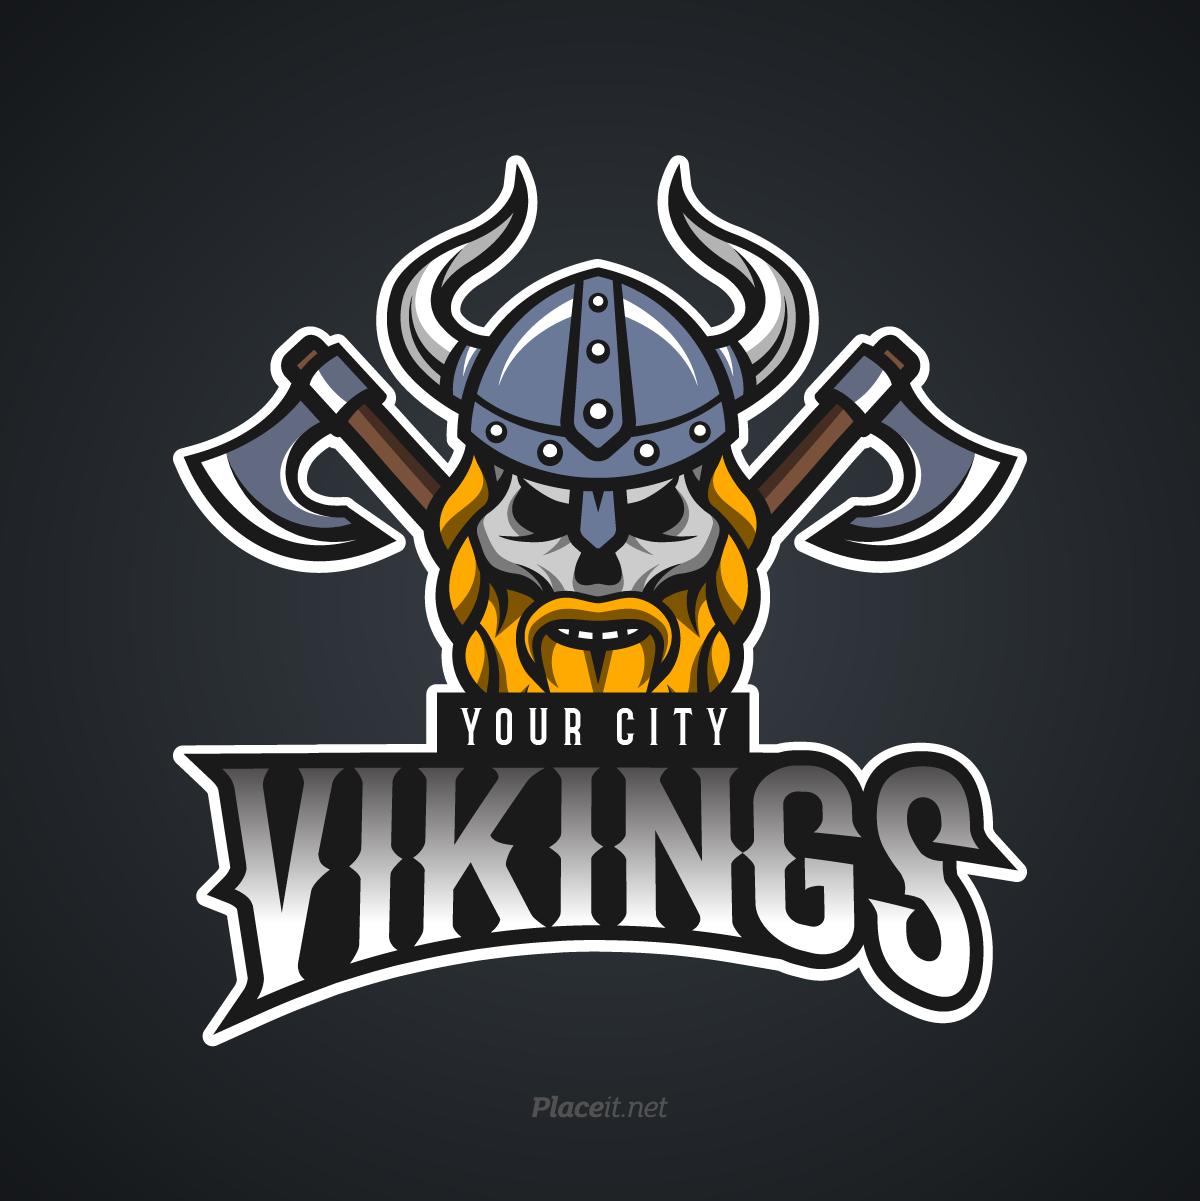 Vikings sports logo